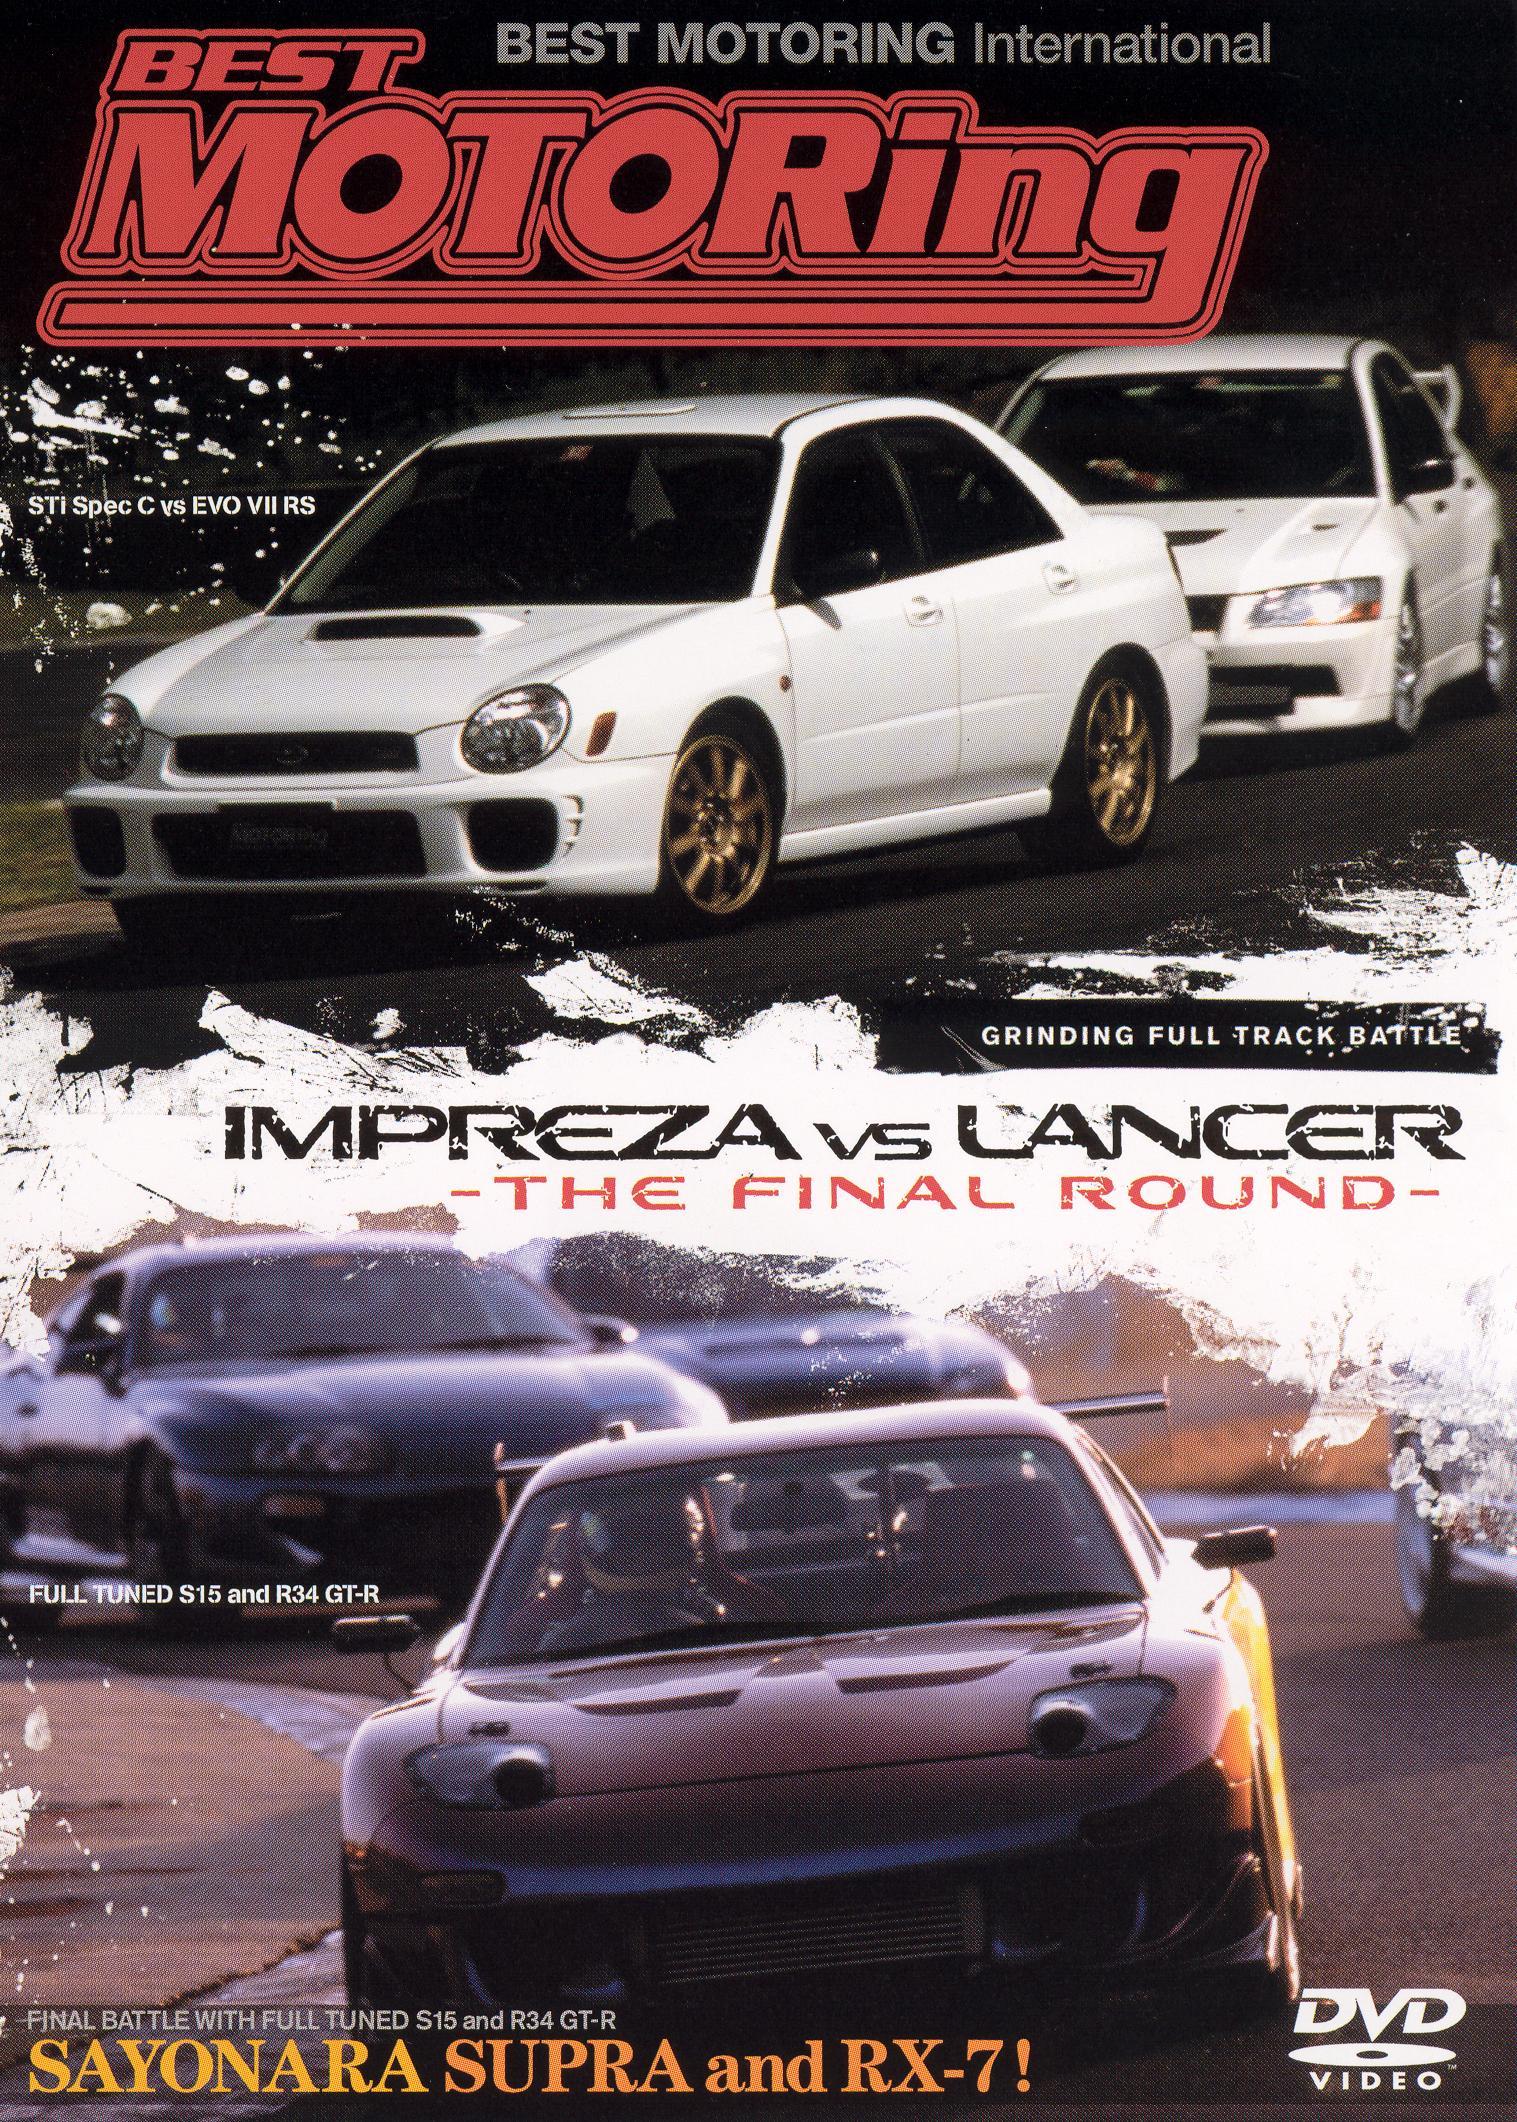 Best Motoring: Impreza vs. Lancer